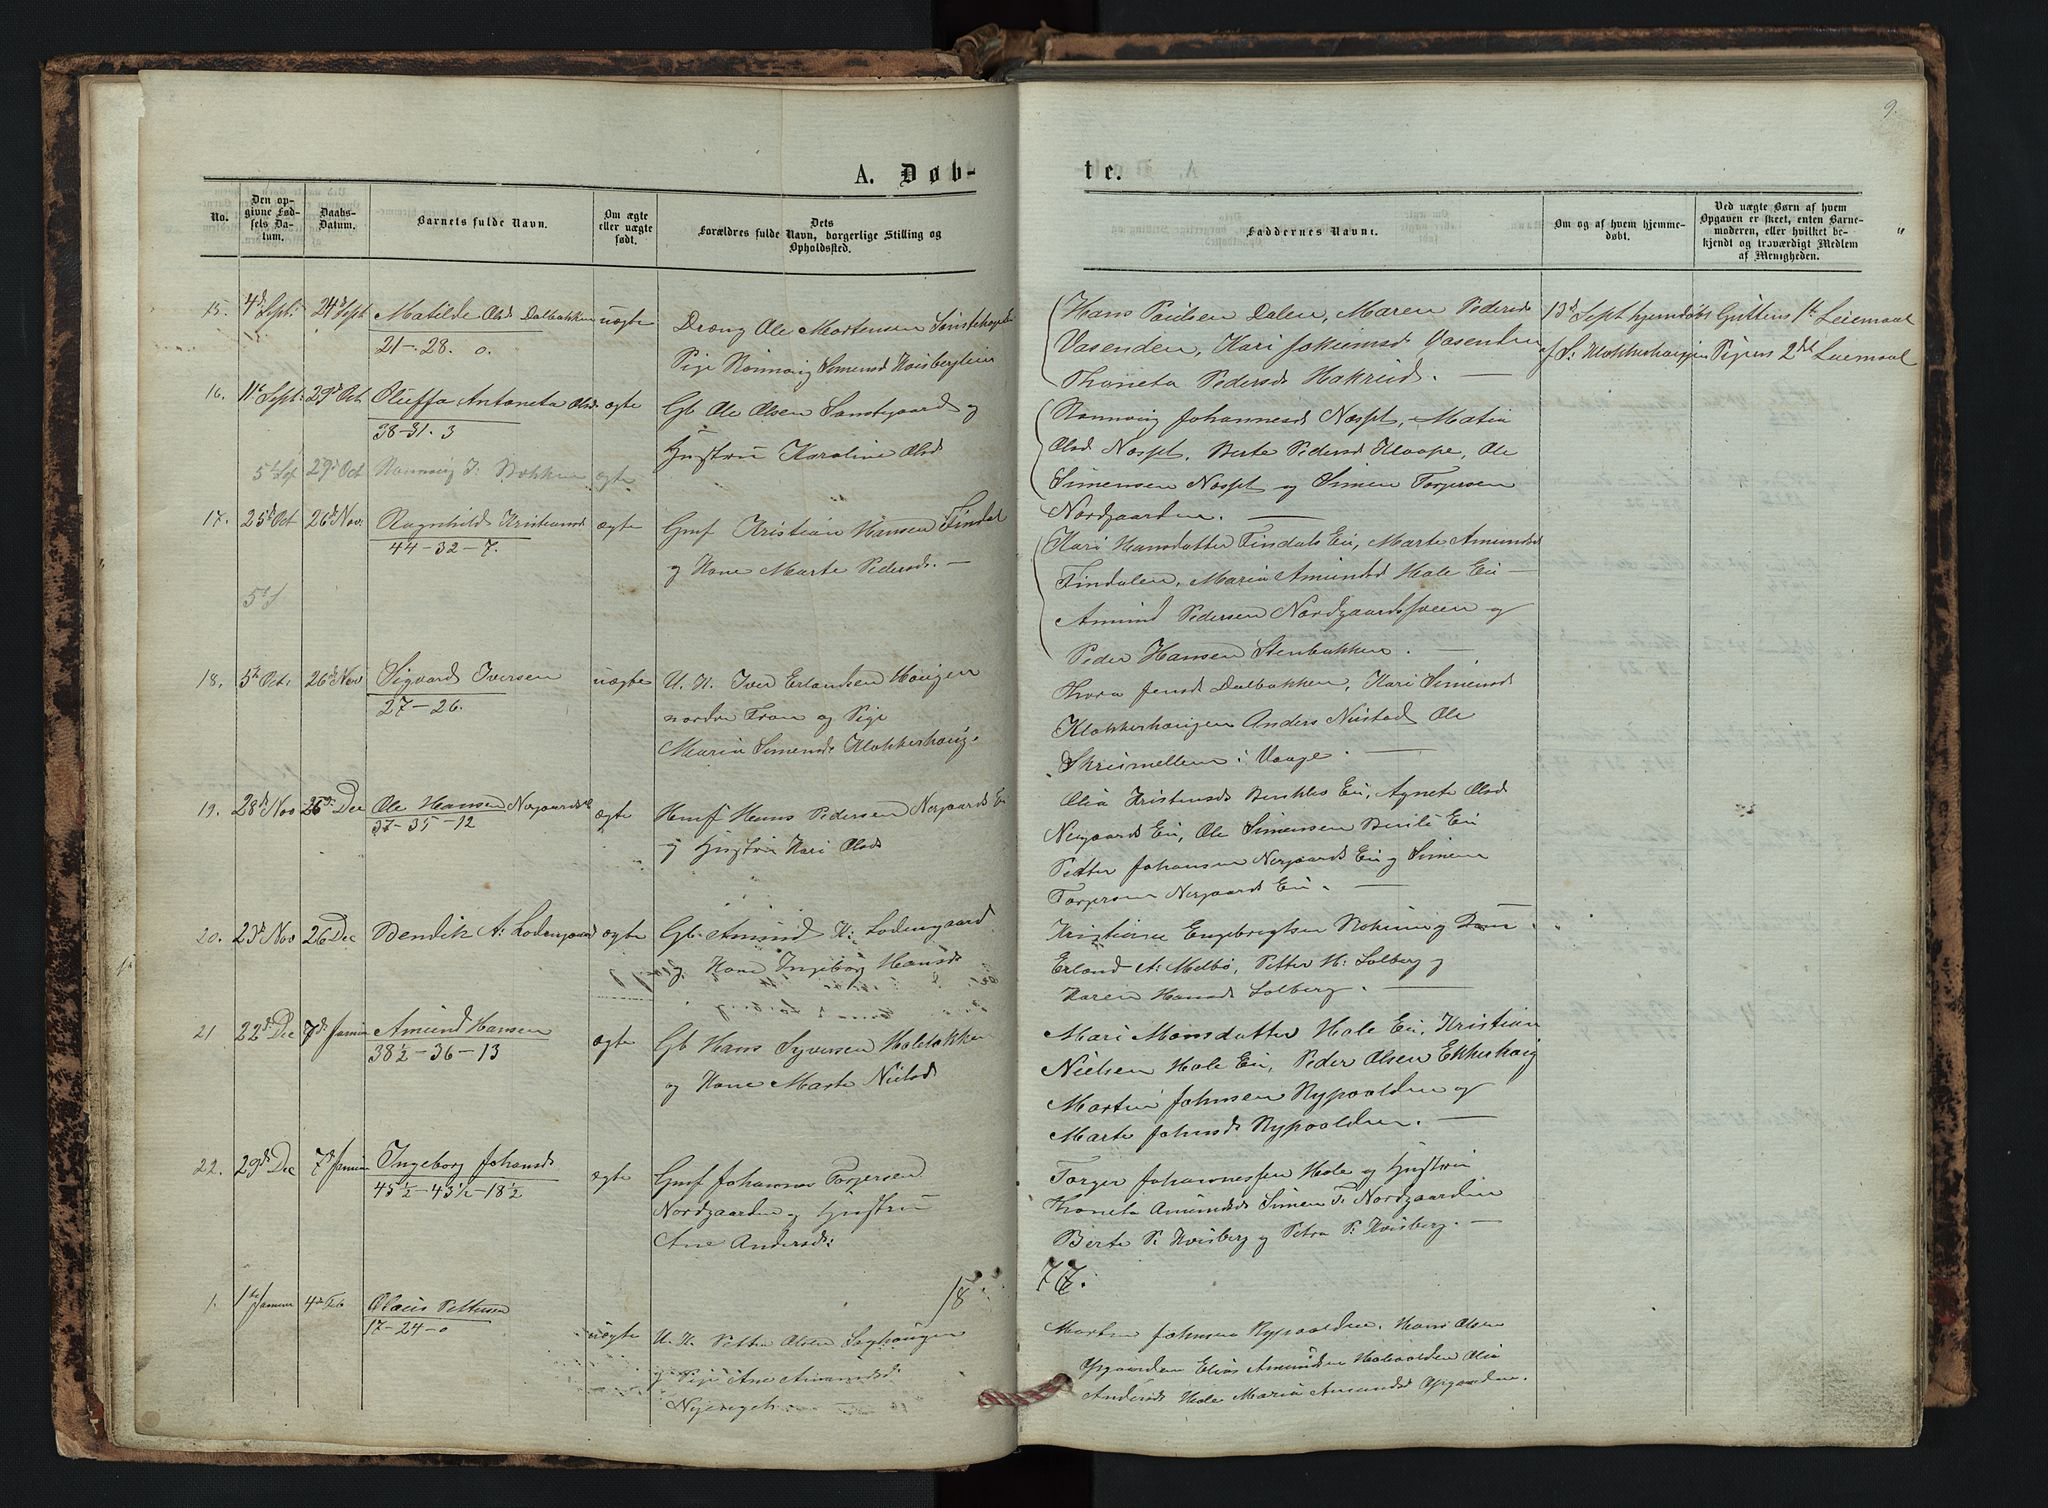 SAH, Vestre Gausdal prestekontor, Klokkerbok nr. 2, 1874-1897, s. 9